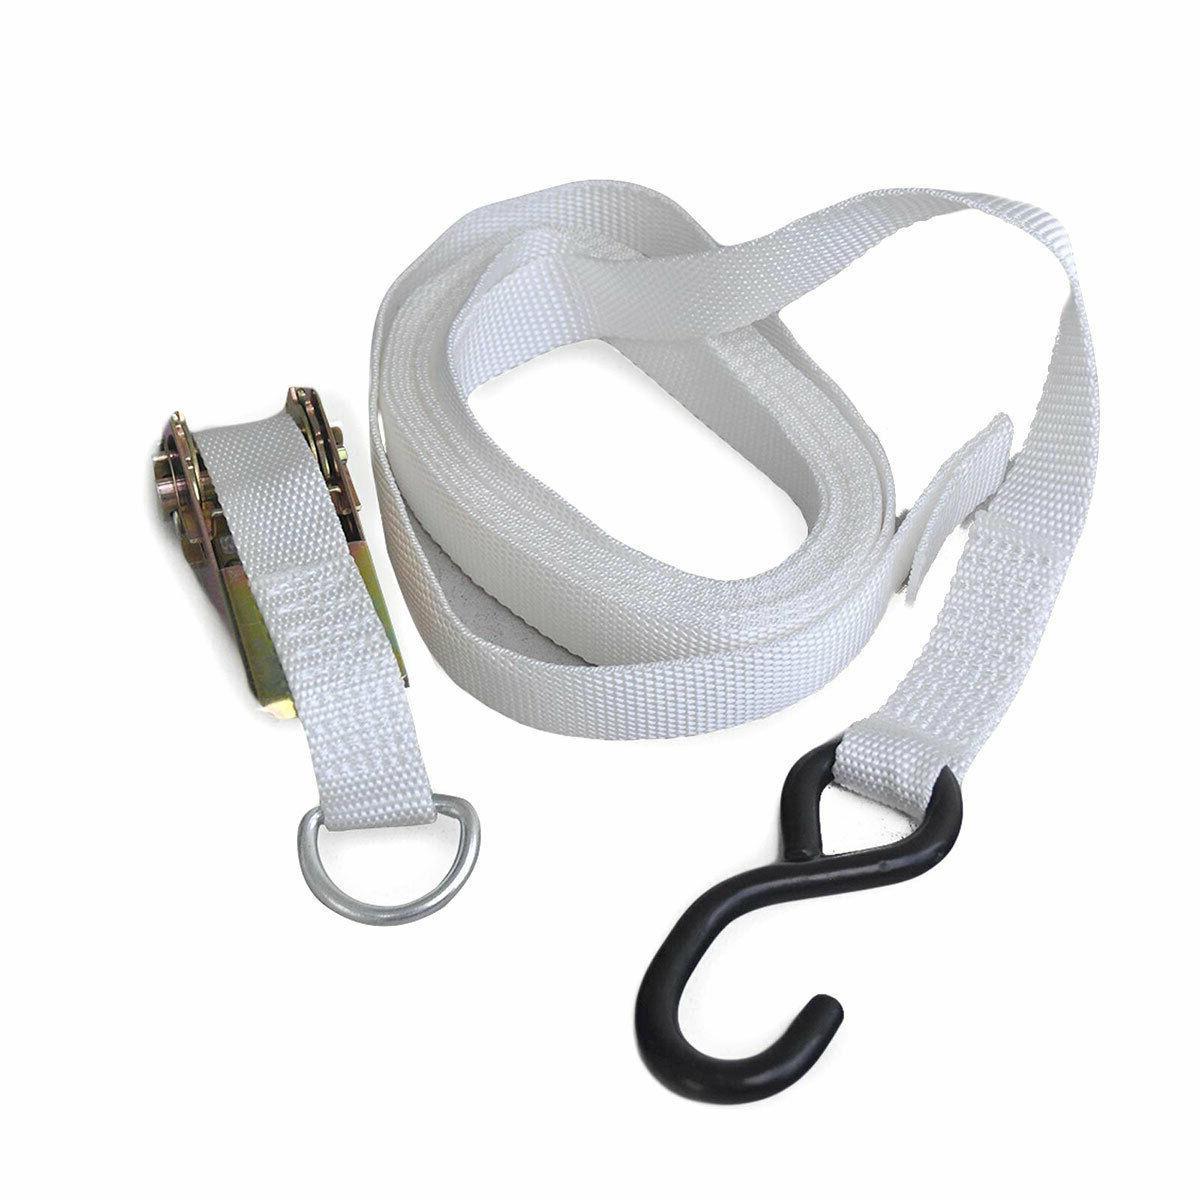 1 x 13 ratchet straps tie down